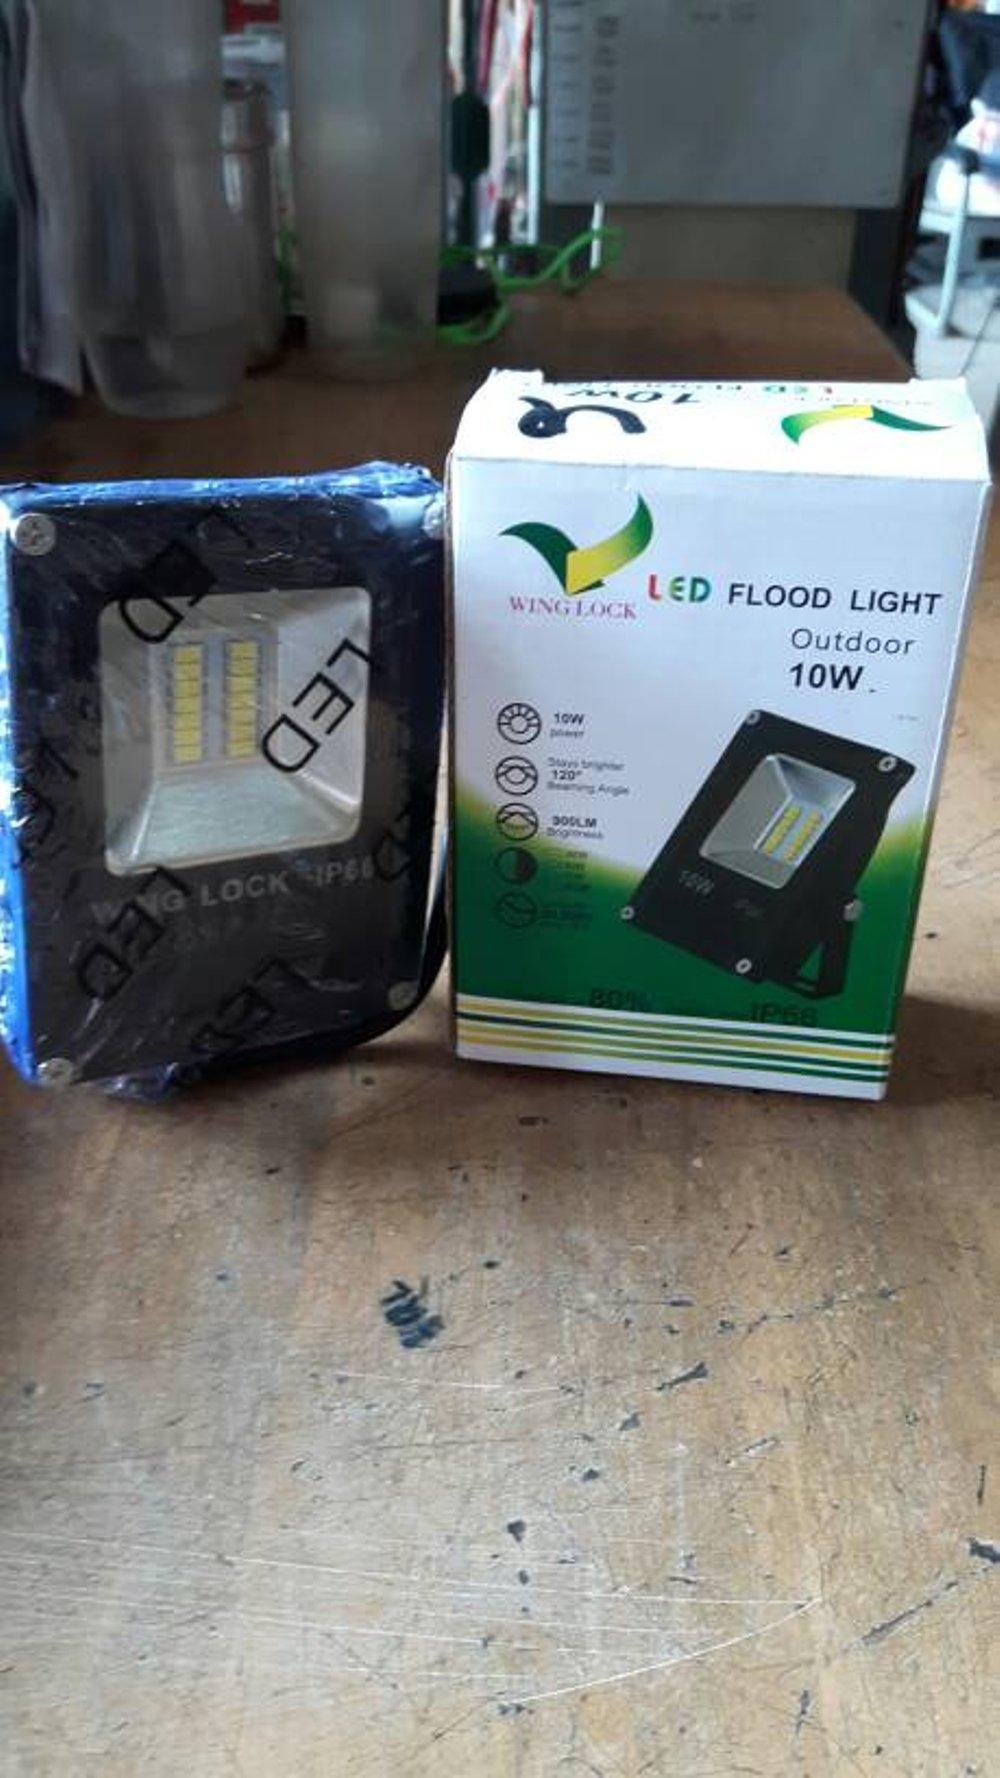 Daftar Harga Lampu Sorot Murah Terbaru 2018 Tembak Led Spion Motor Lemari Etalase 4 Mata 12v 2w Floodlight 10w Berkualiitas